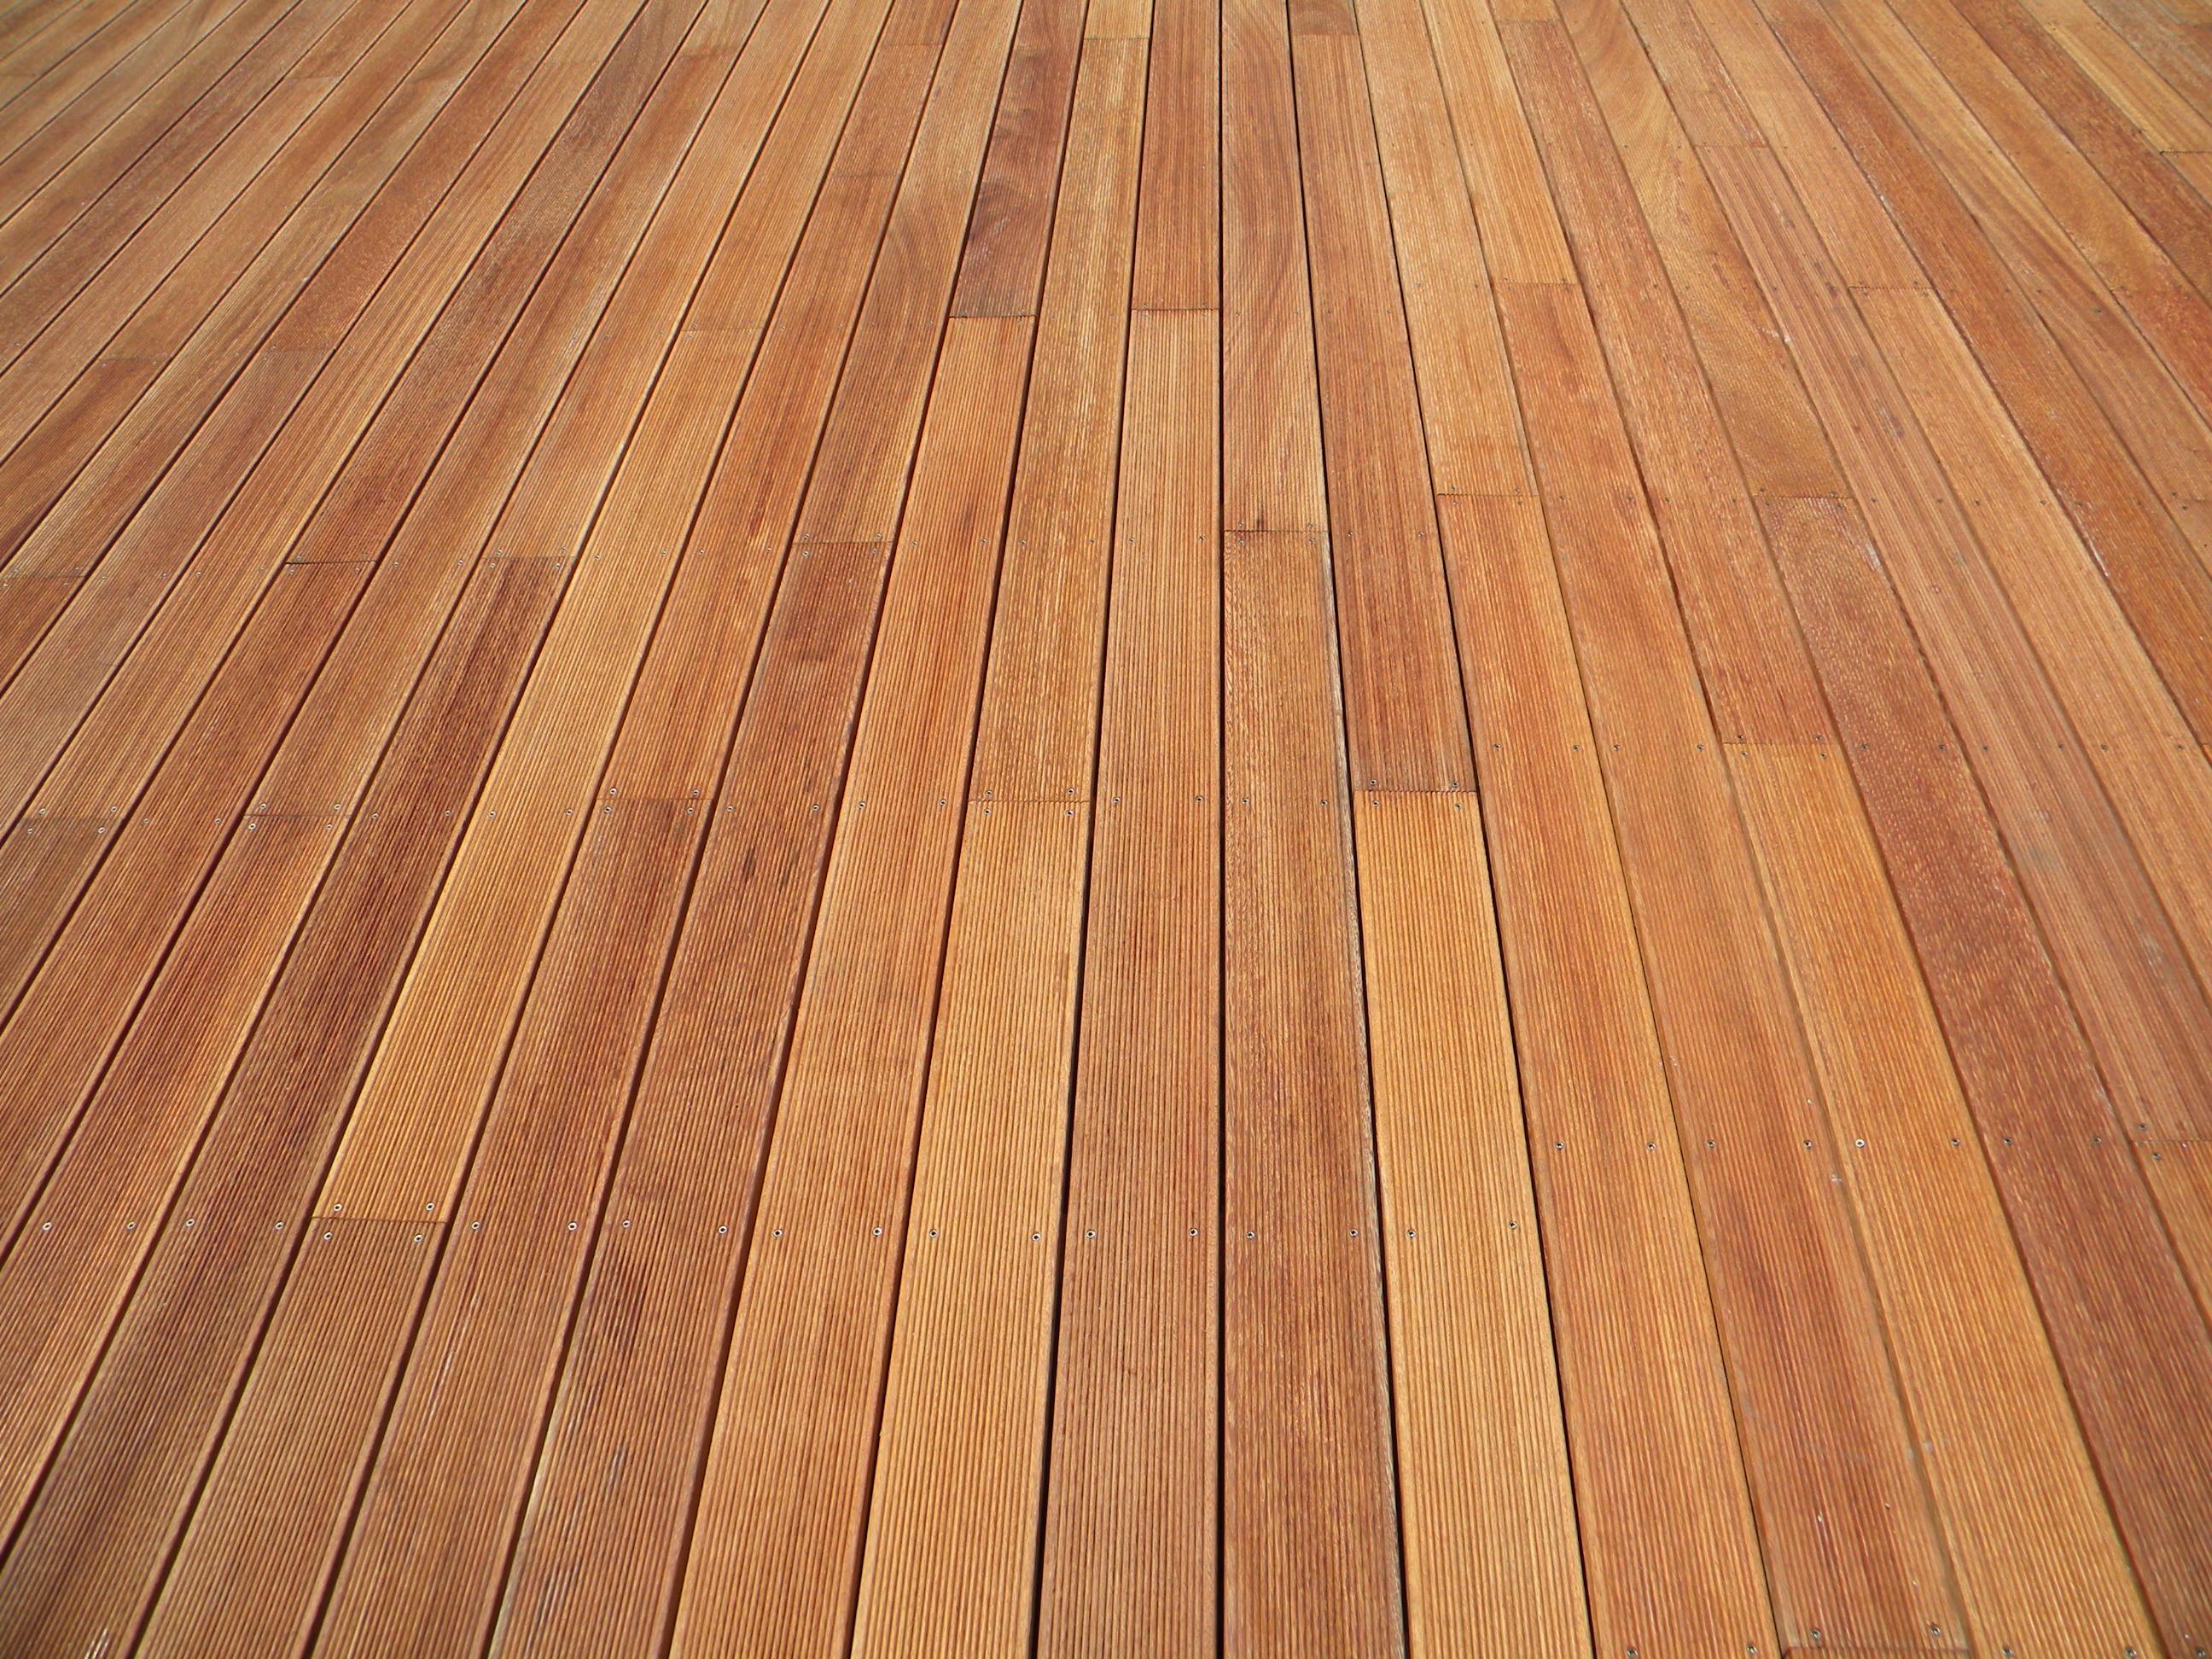 Deck-uri lemn - Angelim Pedra SELVA FLOORS - Poza 62